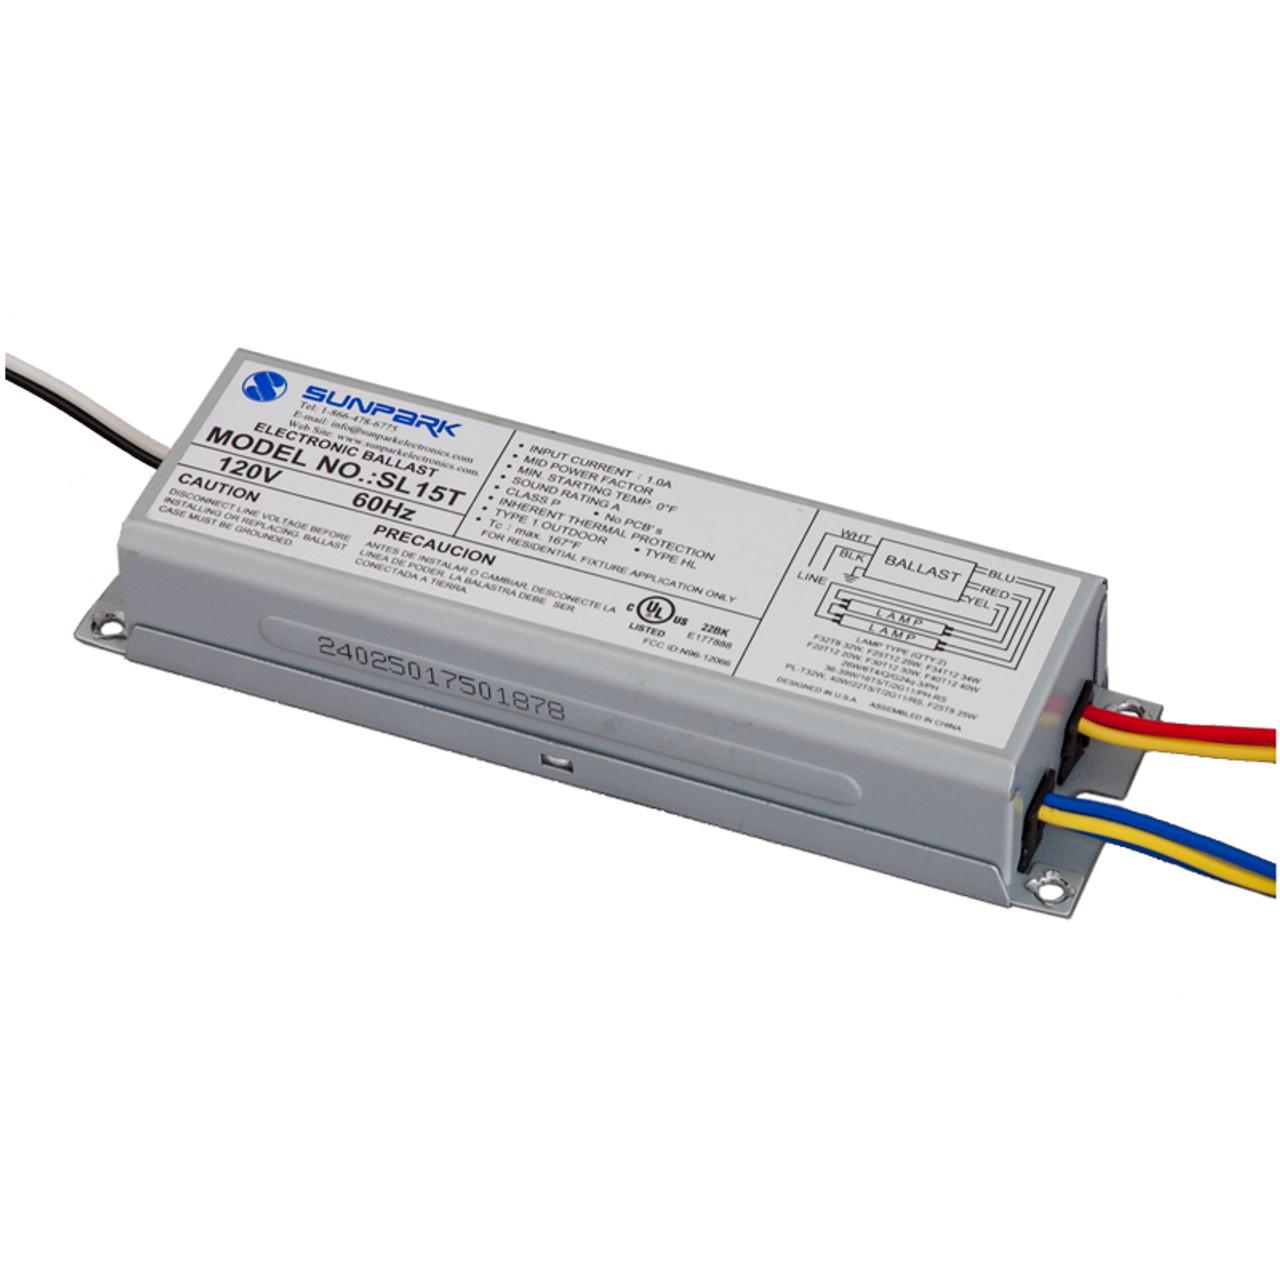 small resolution of sunpark sl15t electronic replacement ballast sunpark sl15t ballast wiring diagram